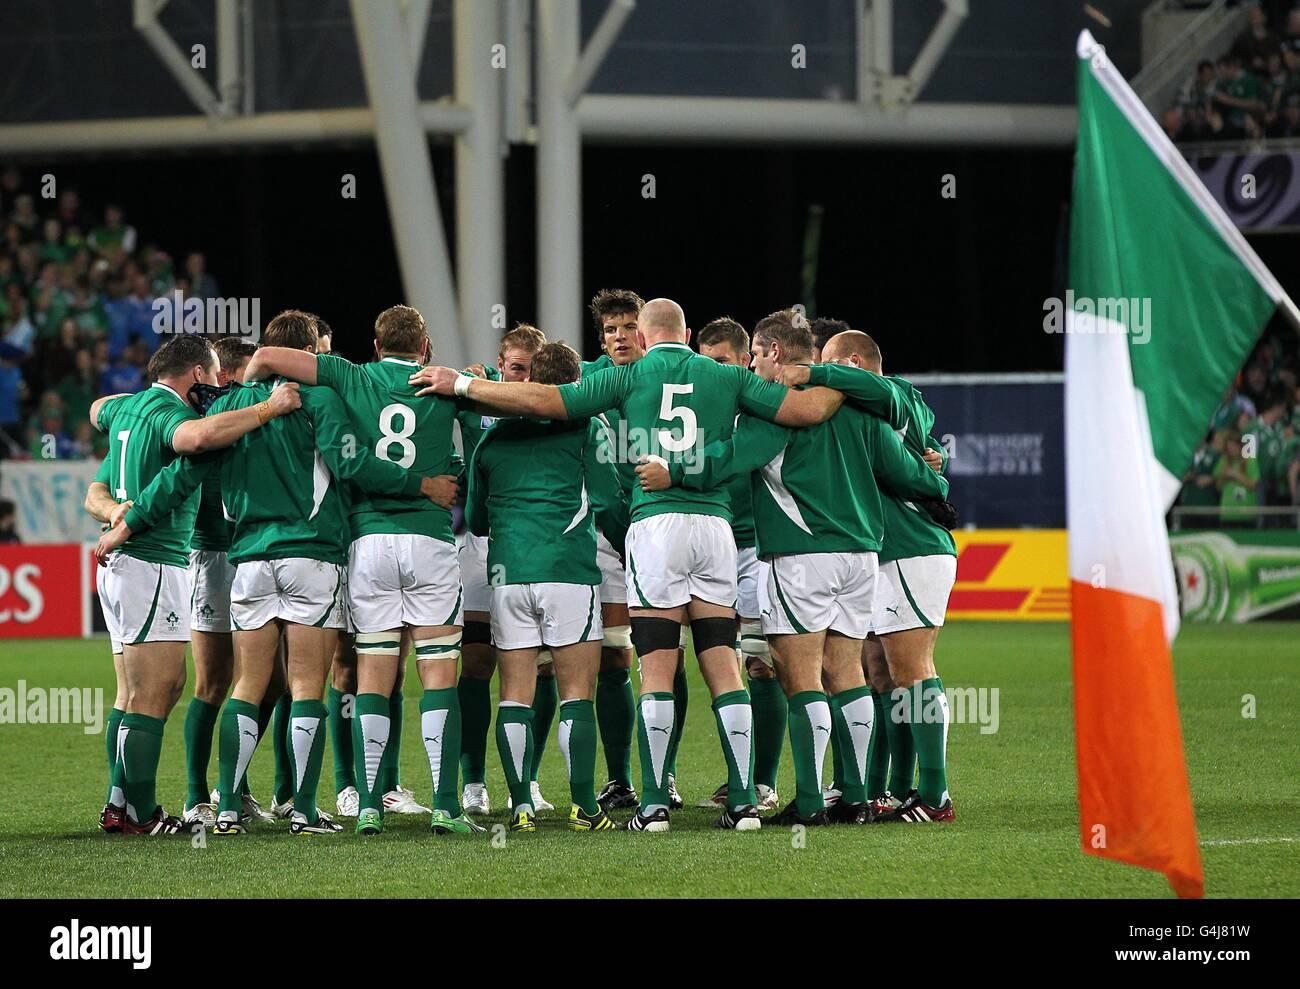 Ireland Pool Stock Photos & Ireland Pool Stock Images - Page